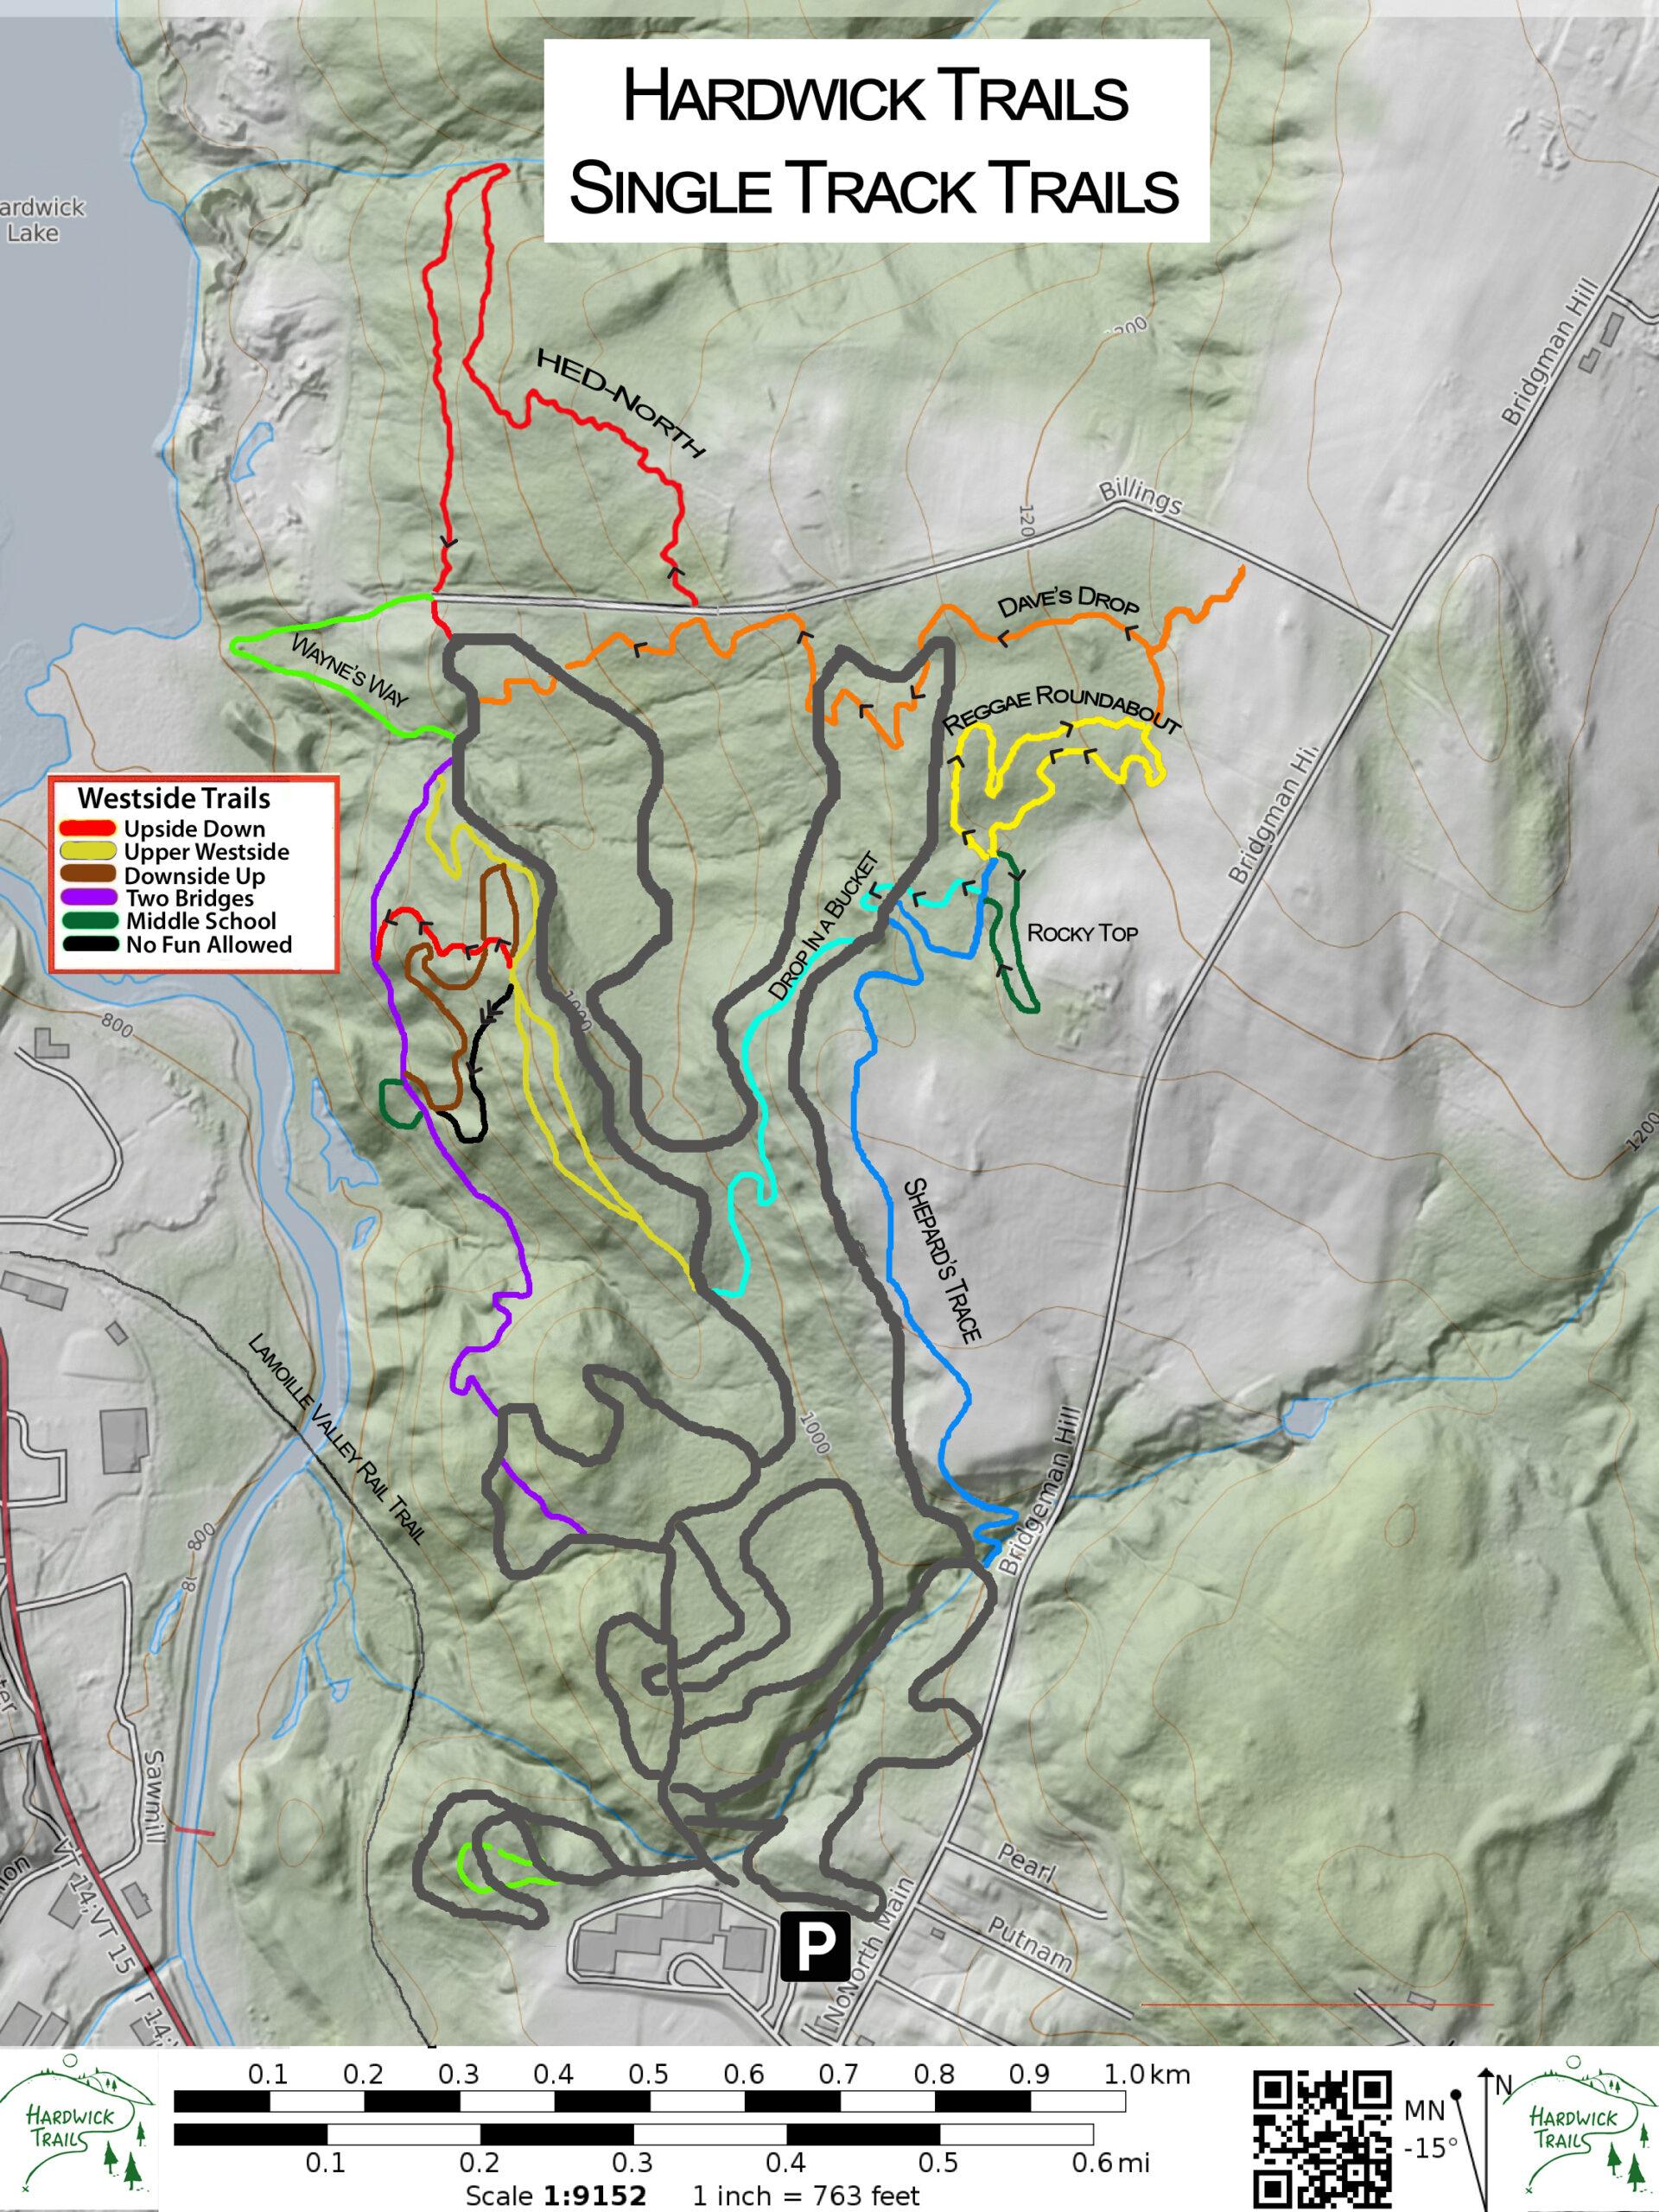 Hardwick Trails Map Single Track trails